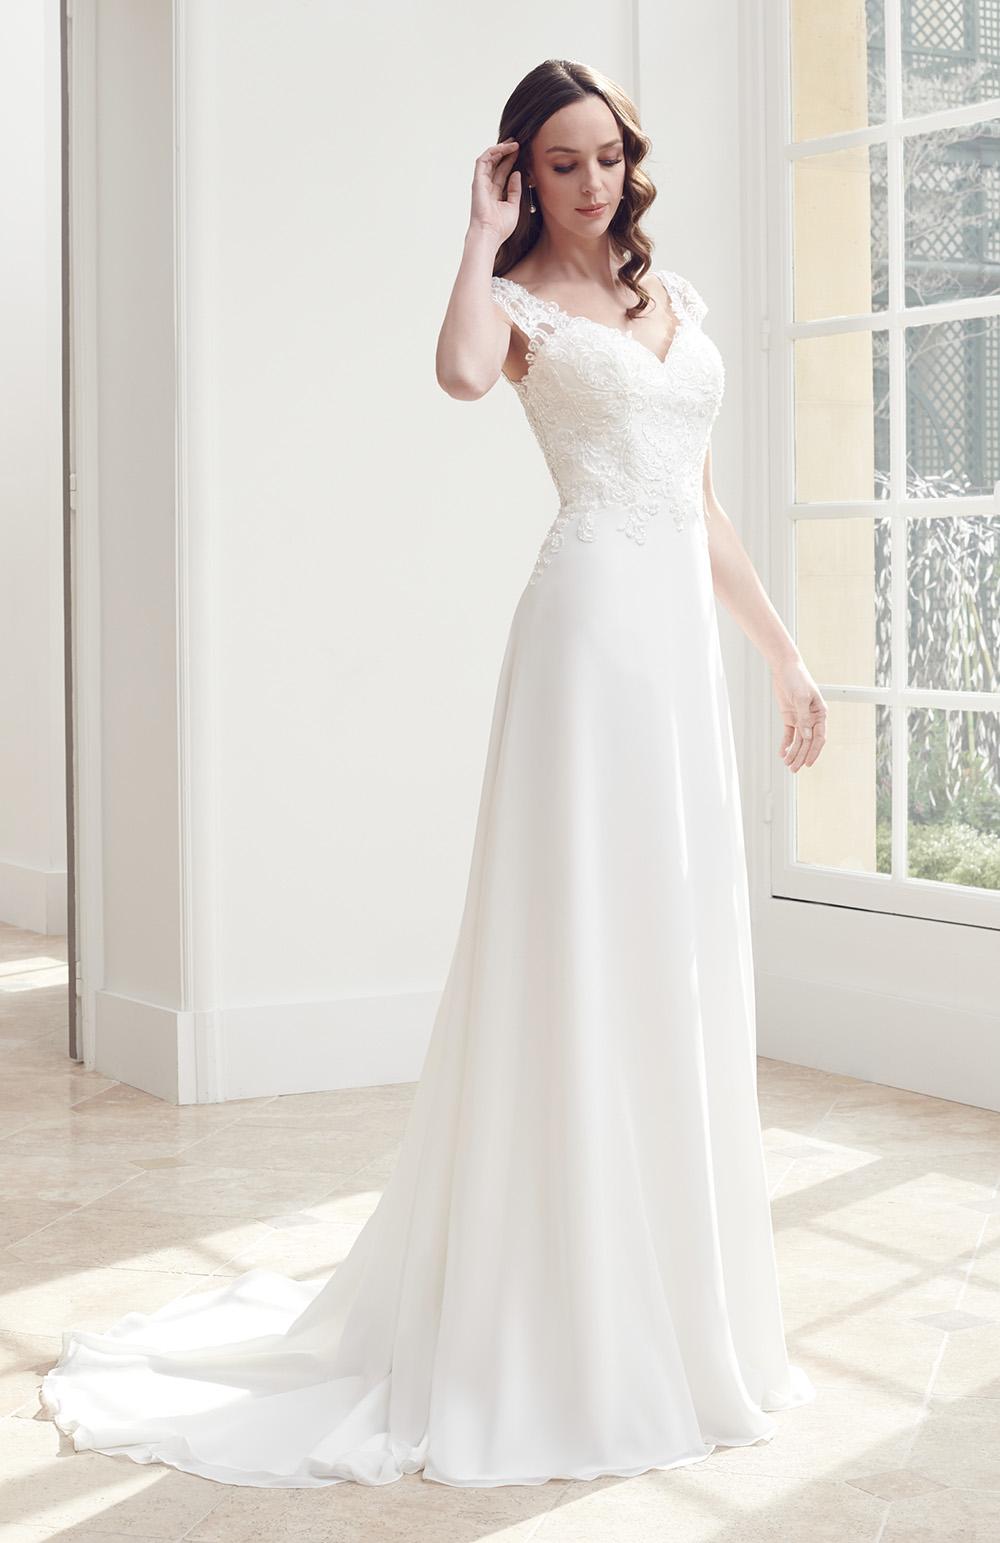 Robe de mariée Modèle Ony